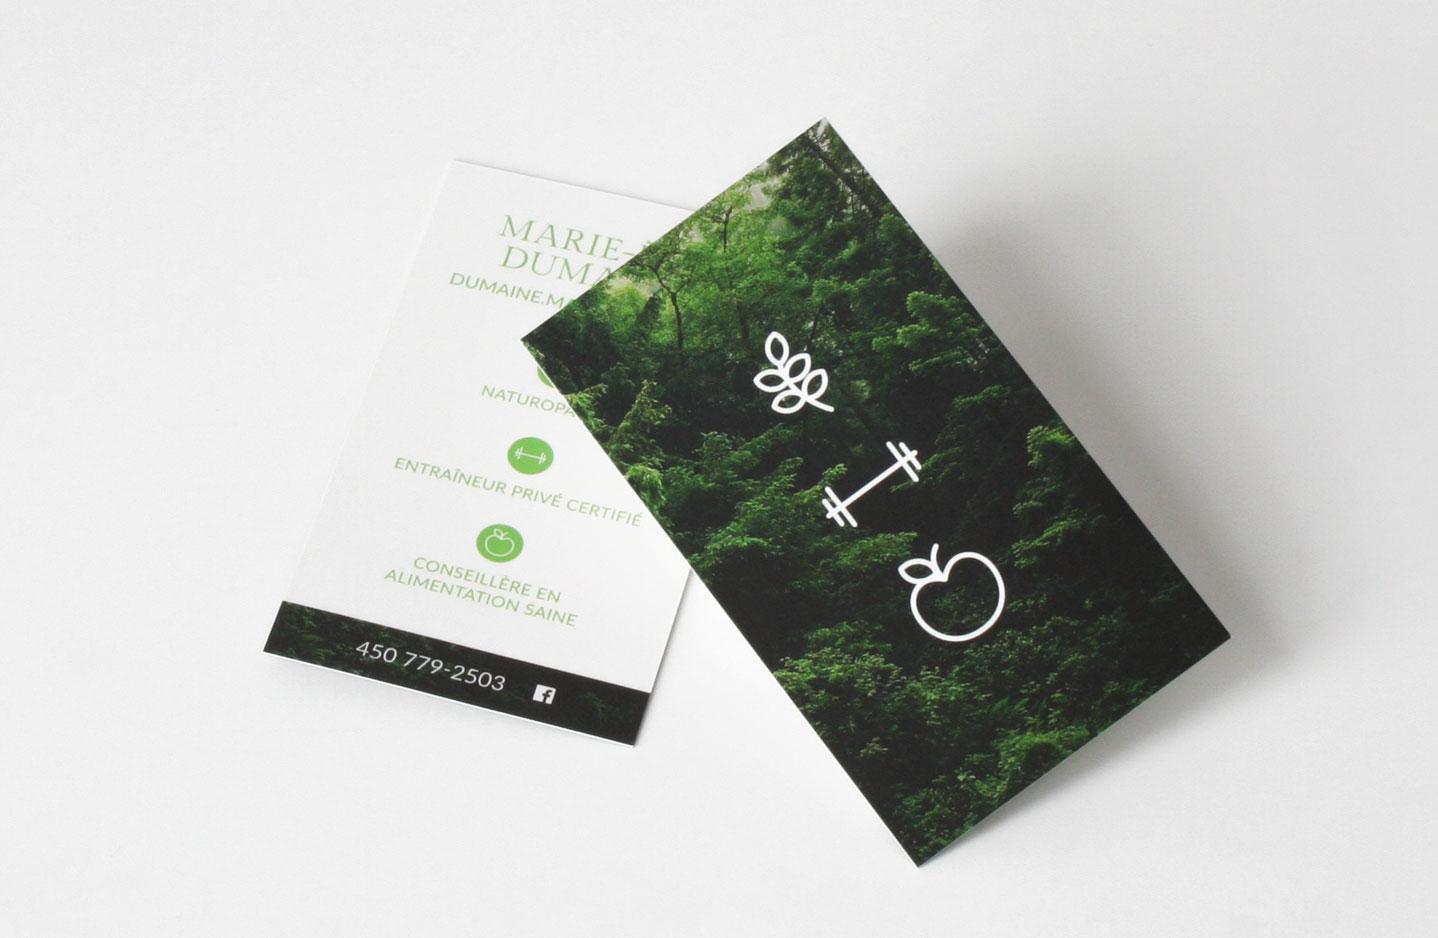 marie-eve-dumaine-cartes-affaires